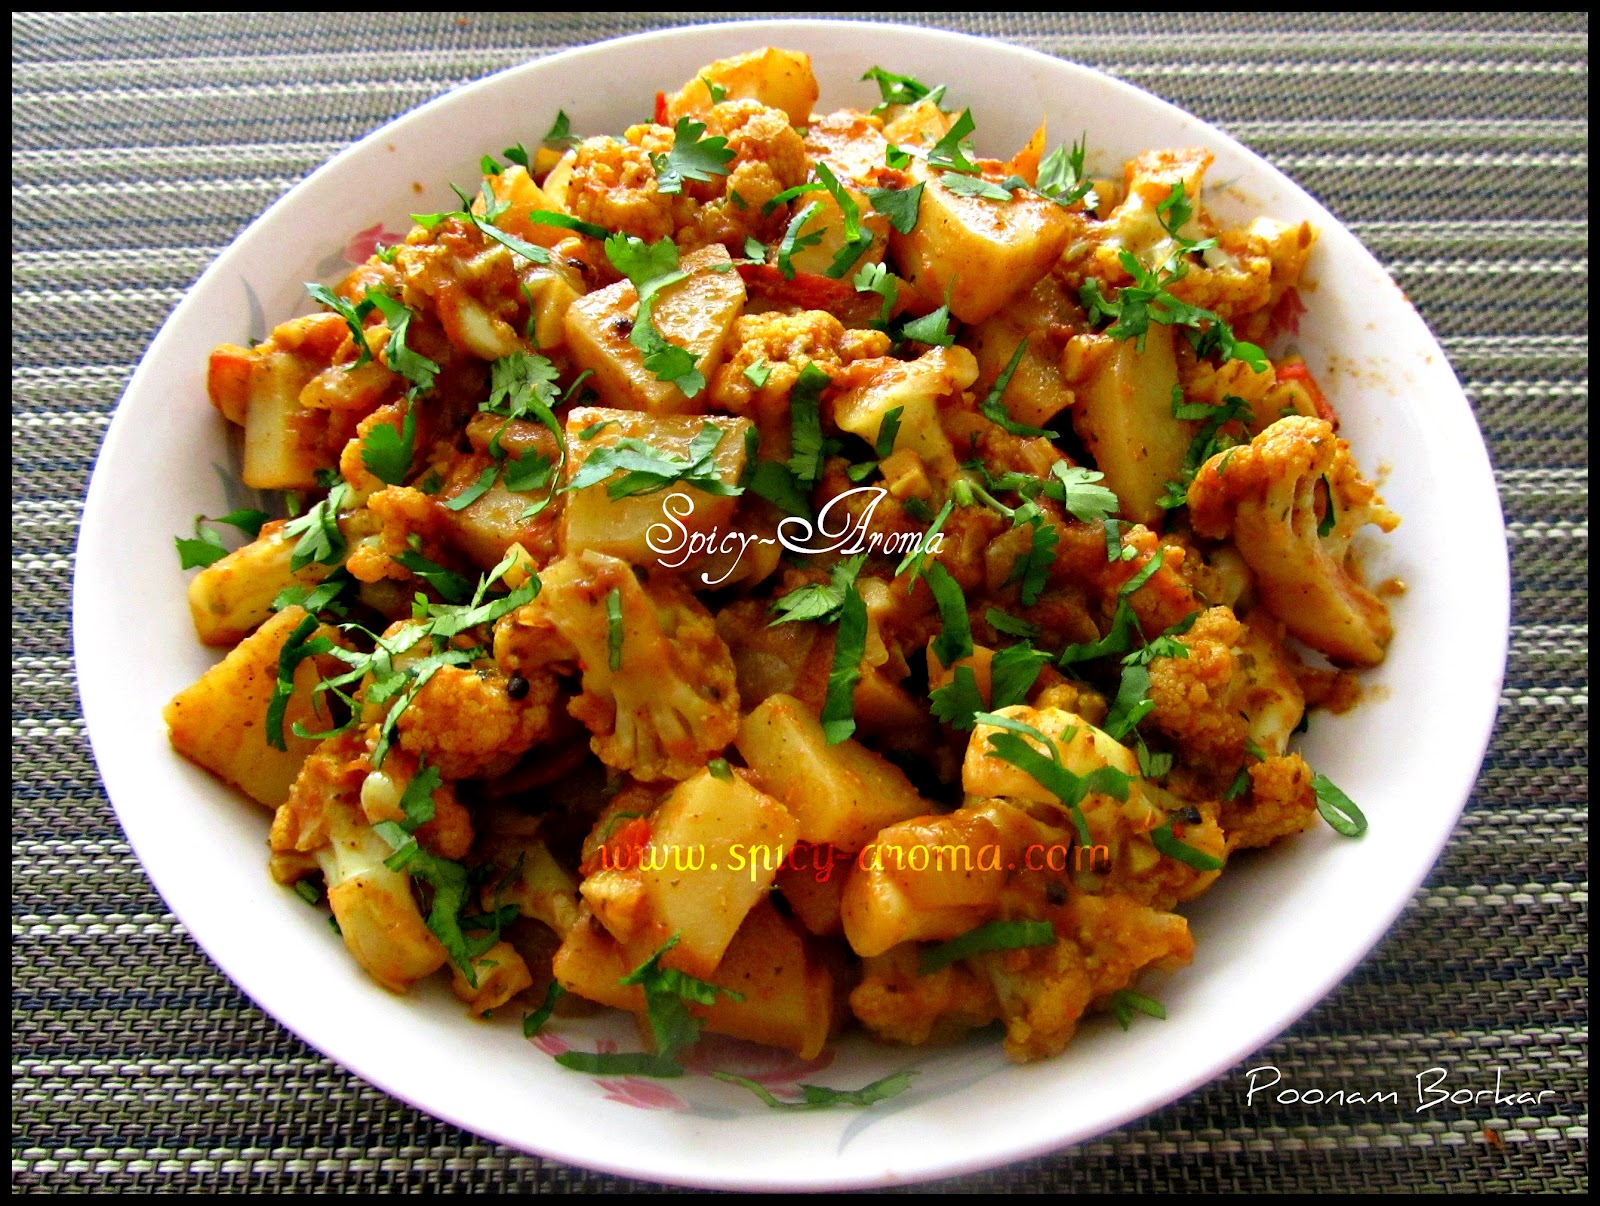 Aloo Gobi | Spicy-Aroma